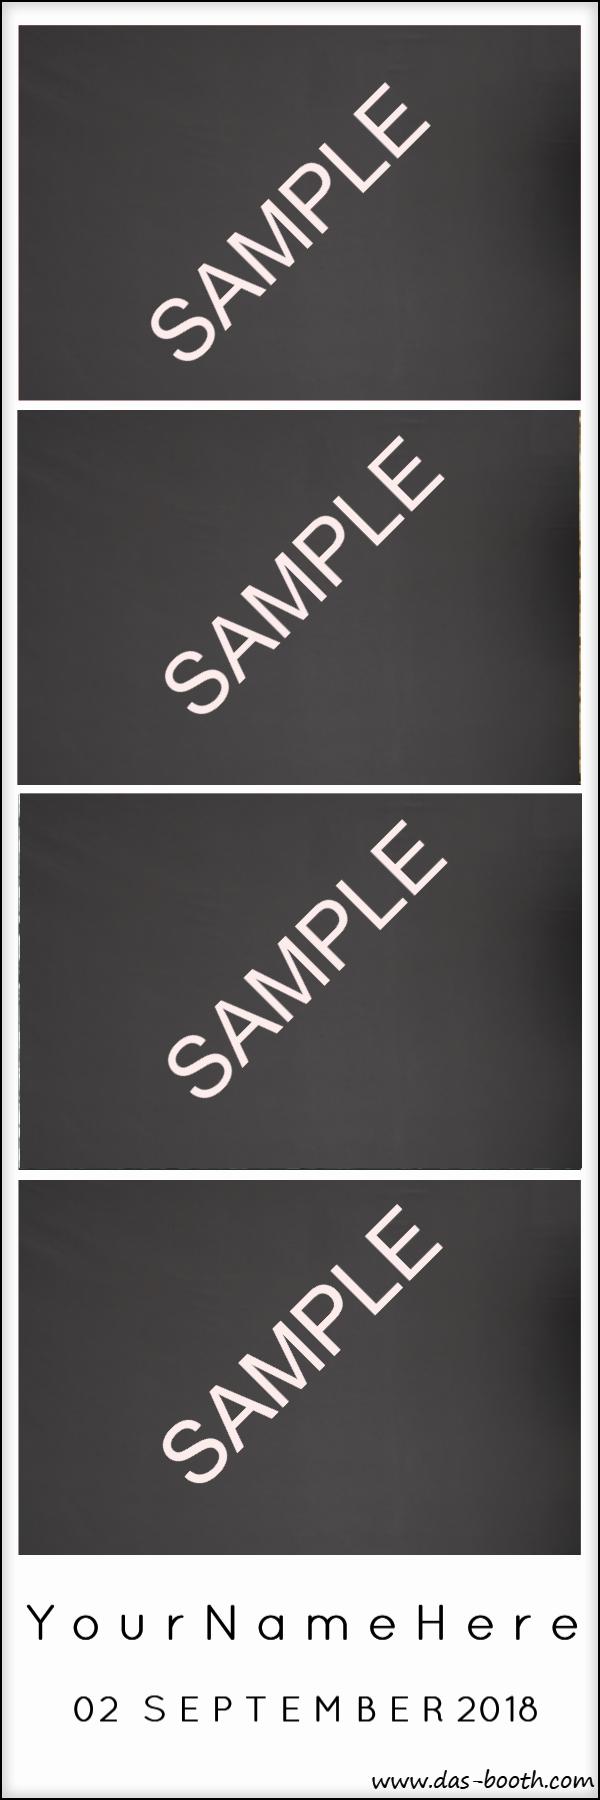 4 photos - vertical - sample2.png